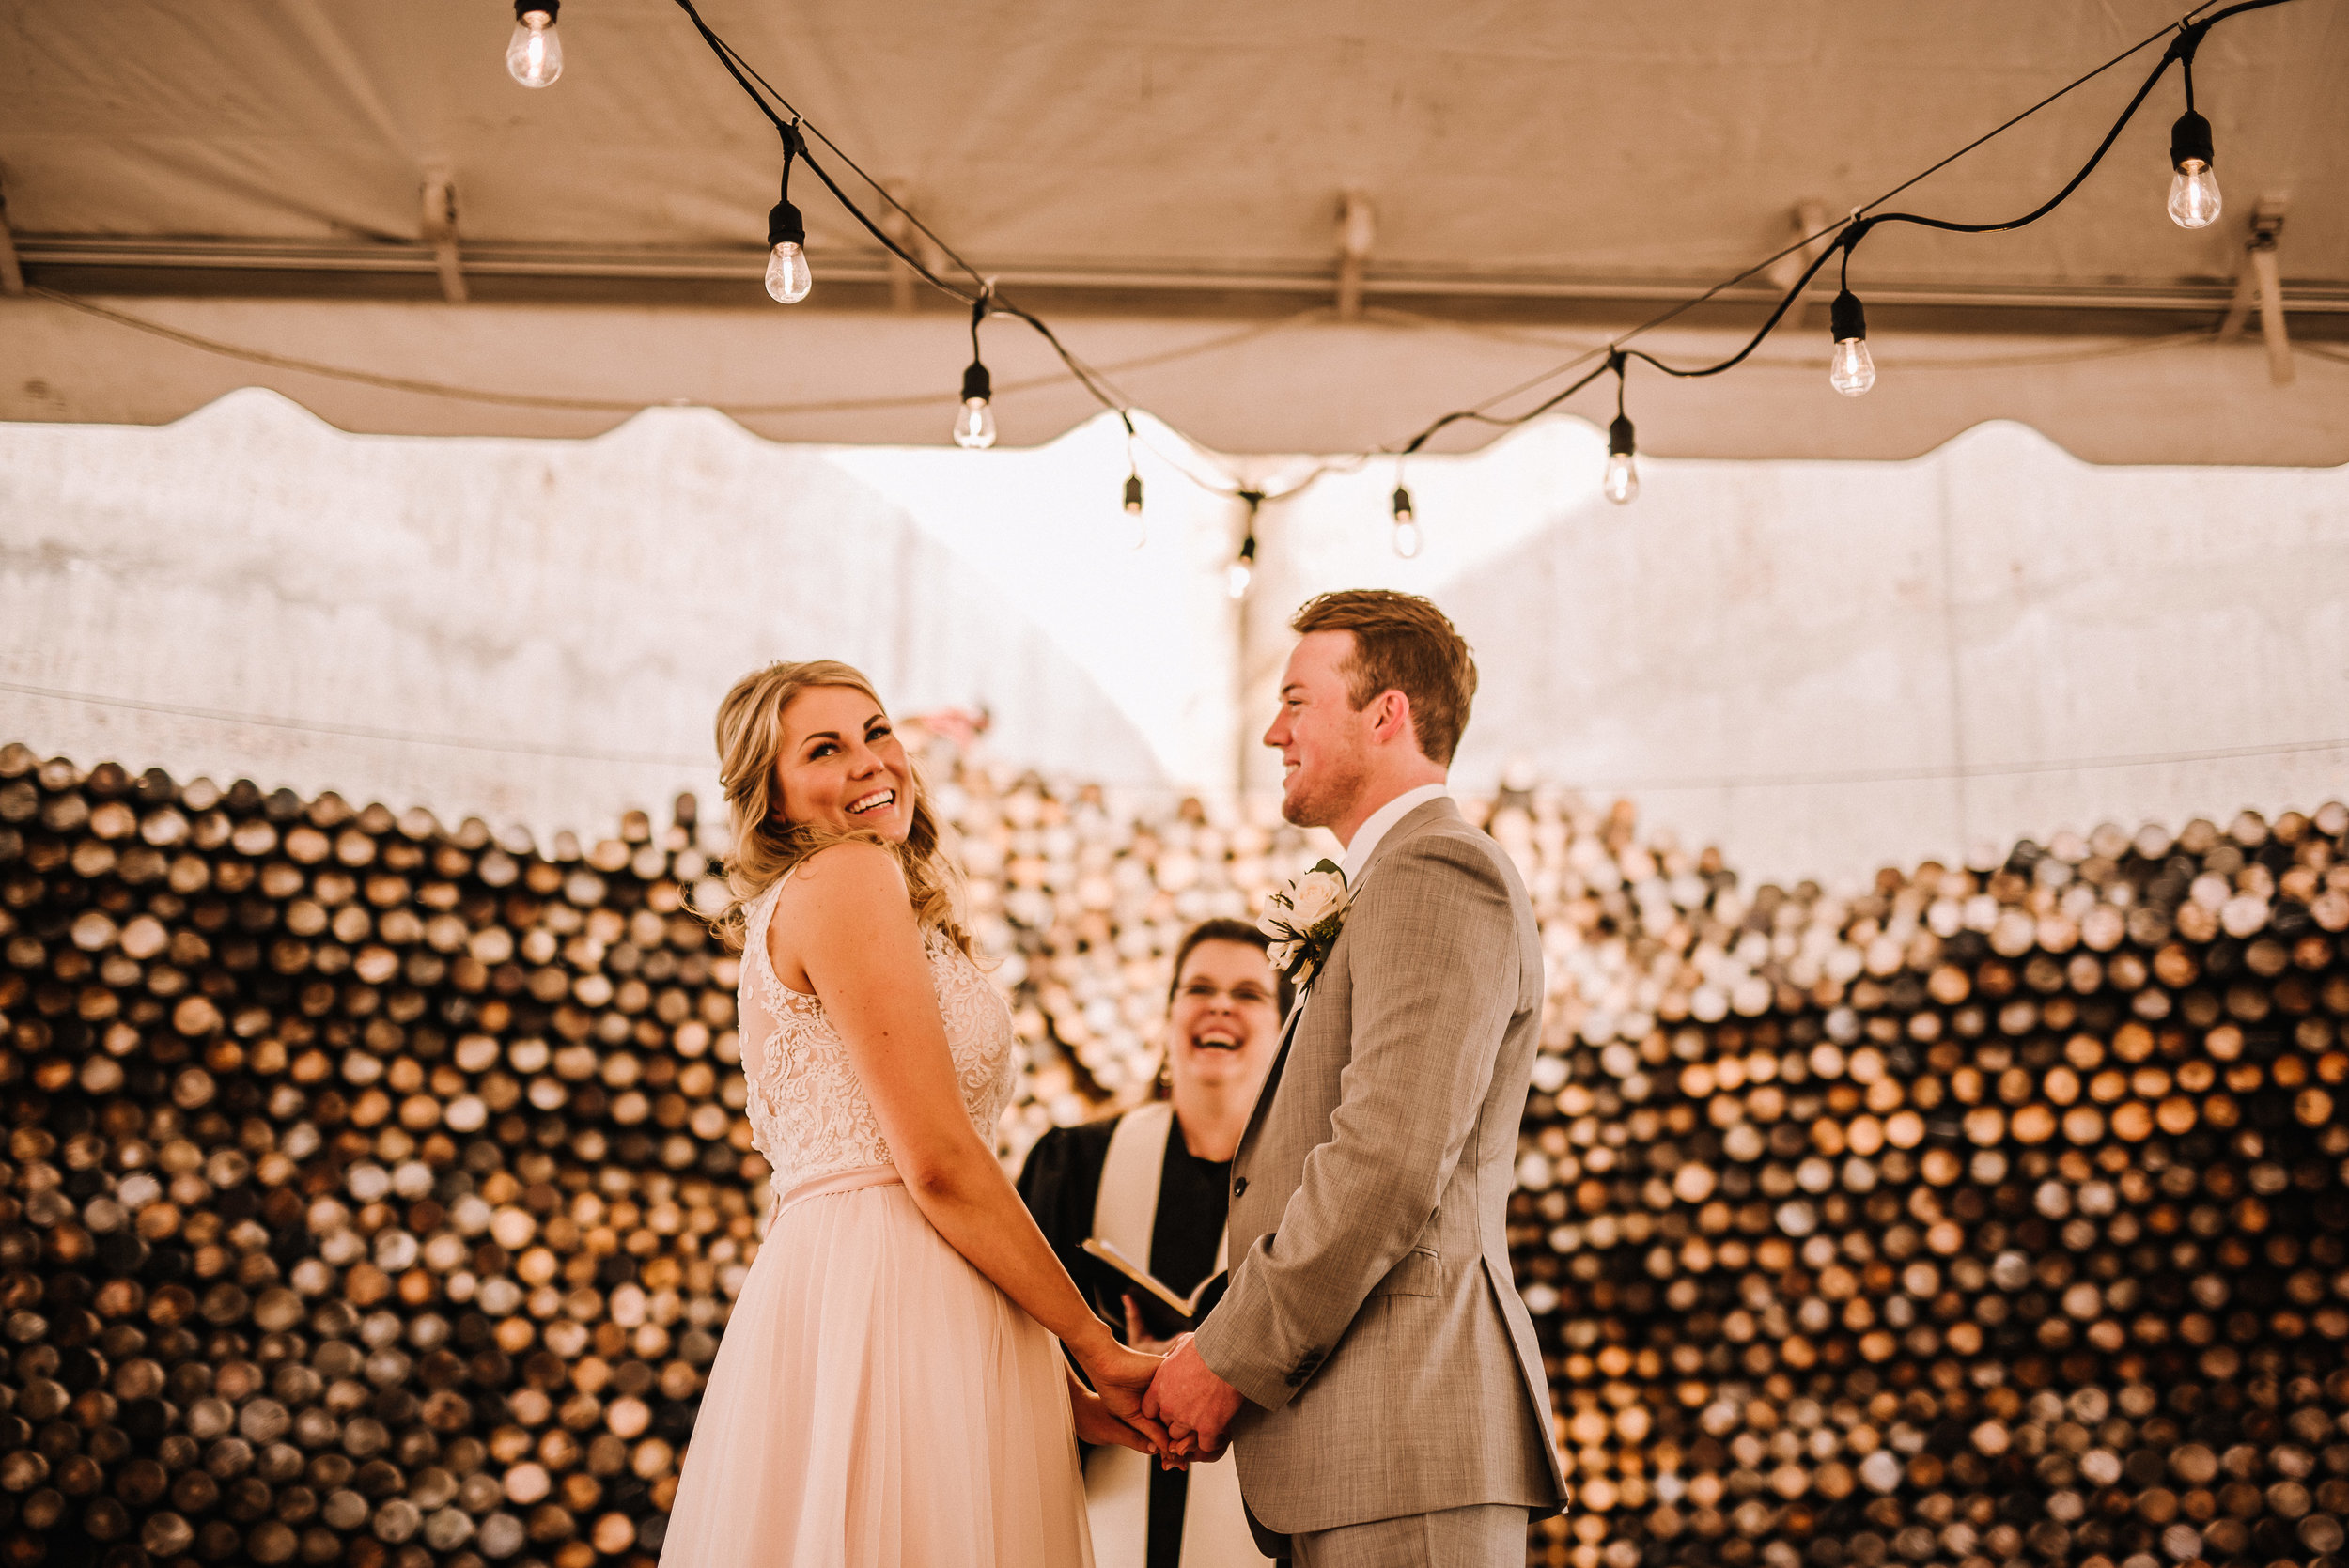 Pearson-Wiseacre-Wedding_Ashley-Benham-Photography (213 of 633).jpg